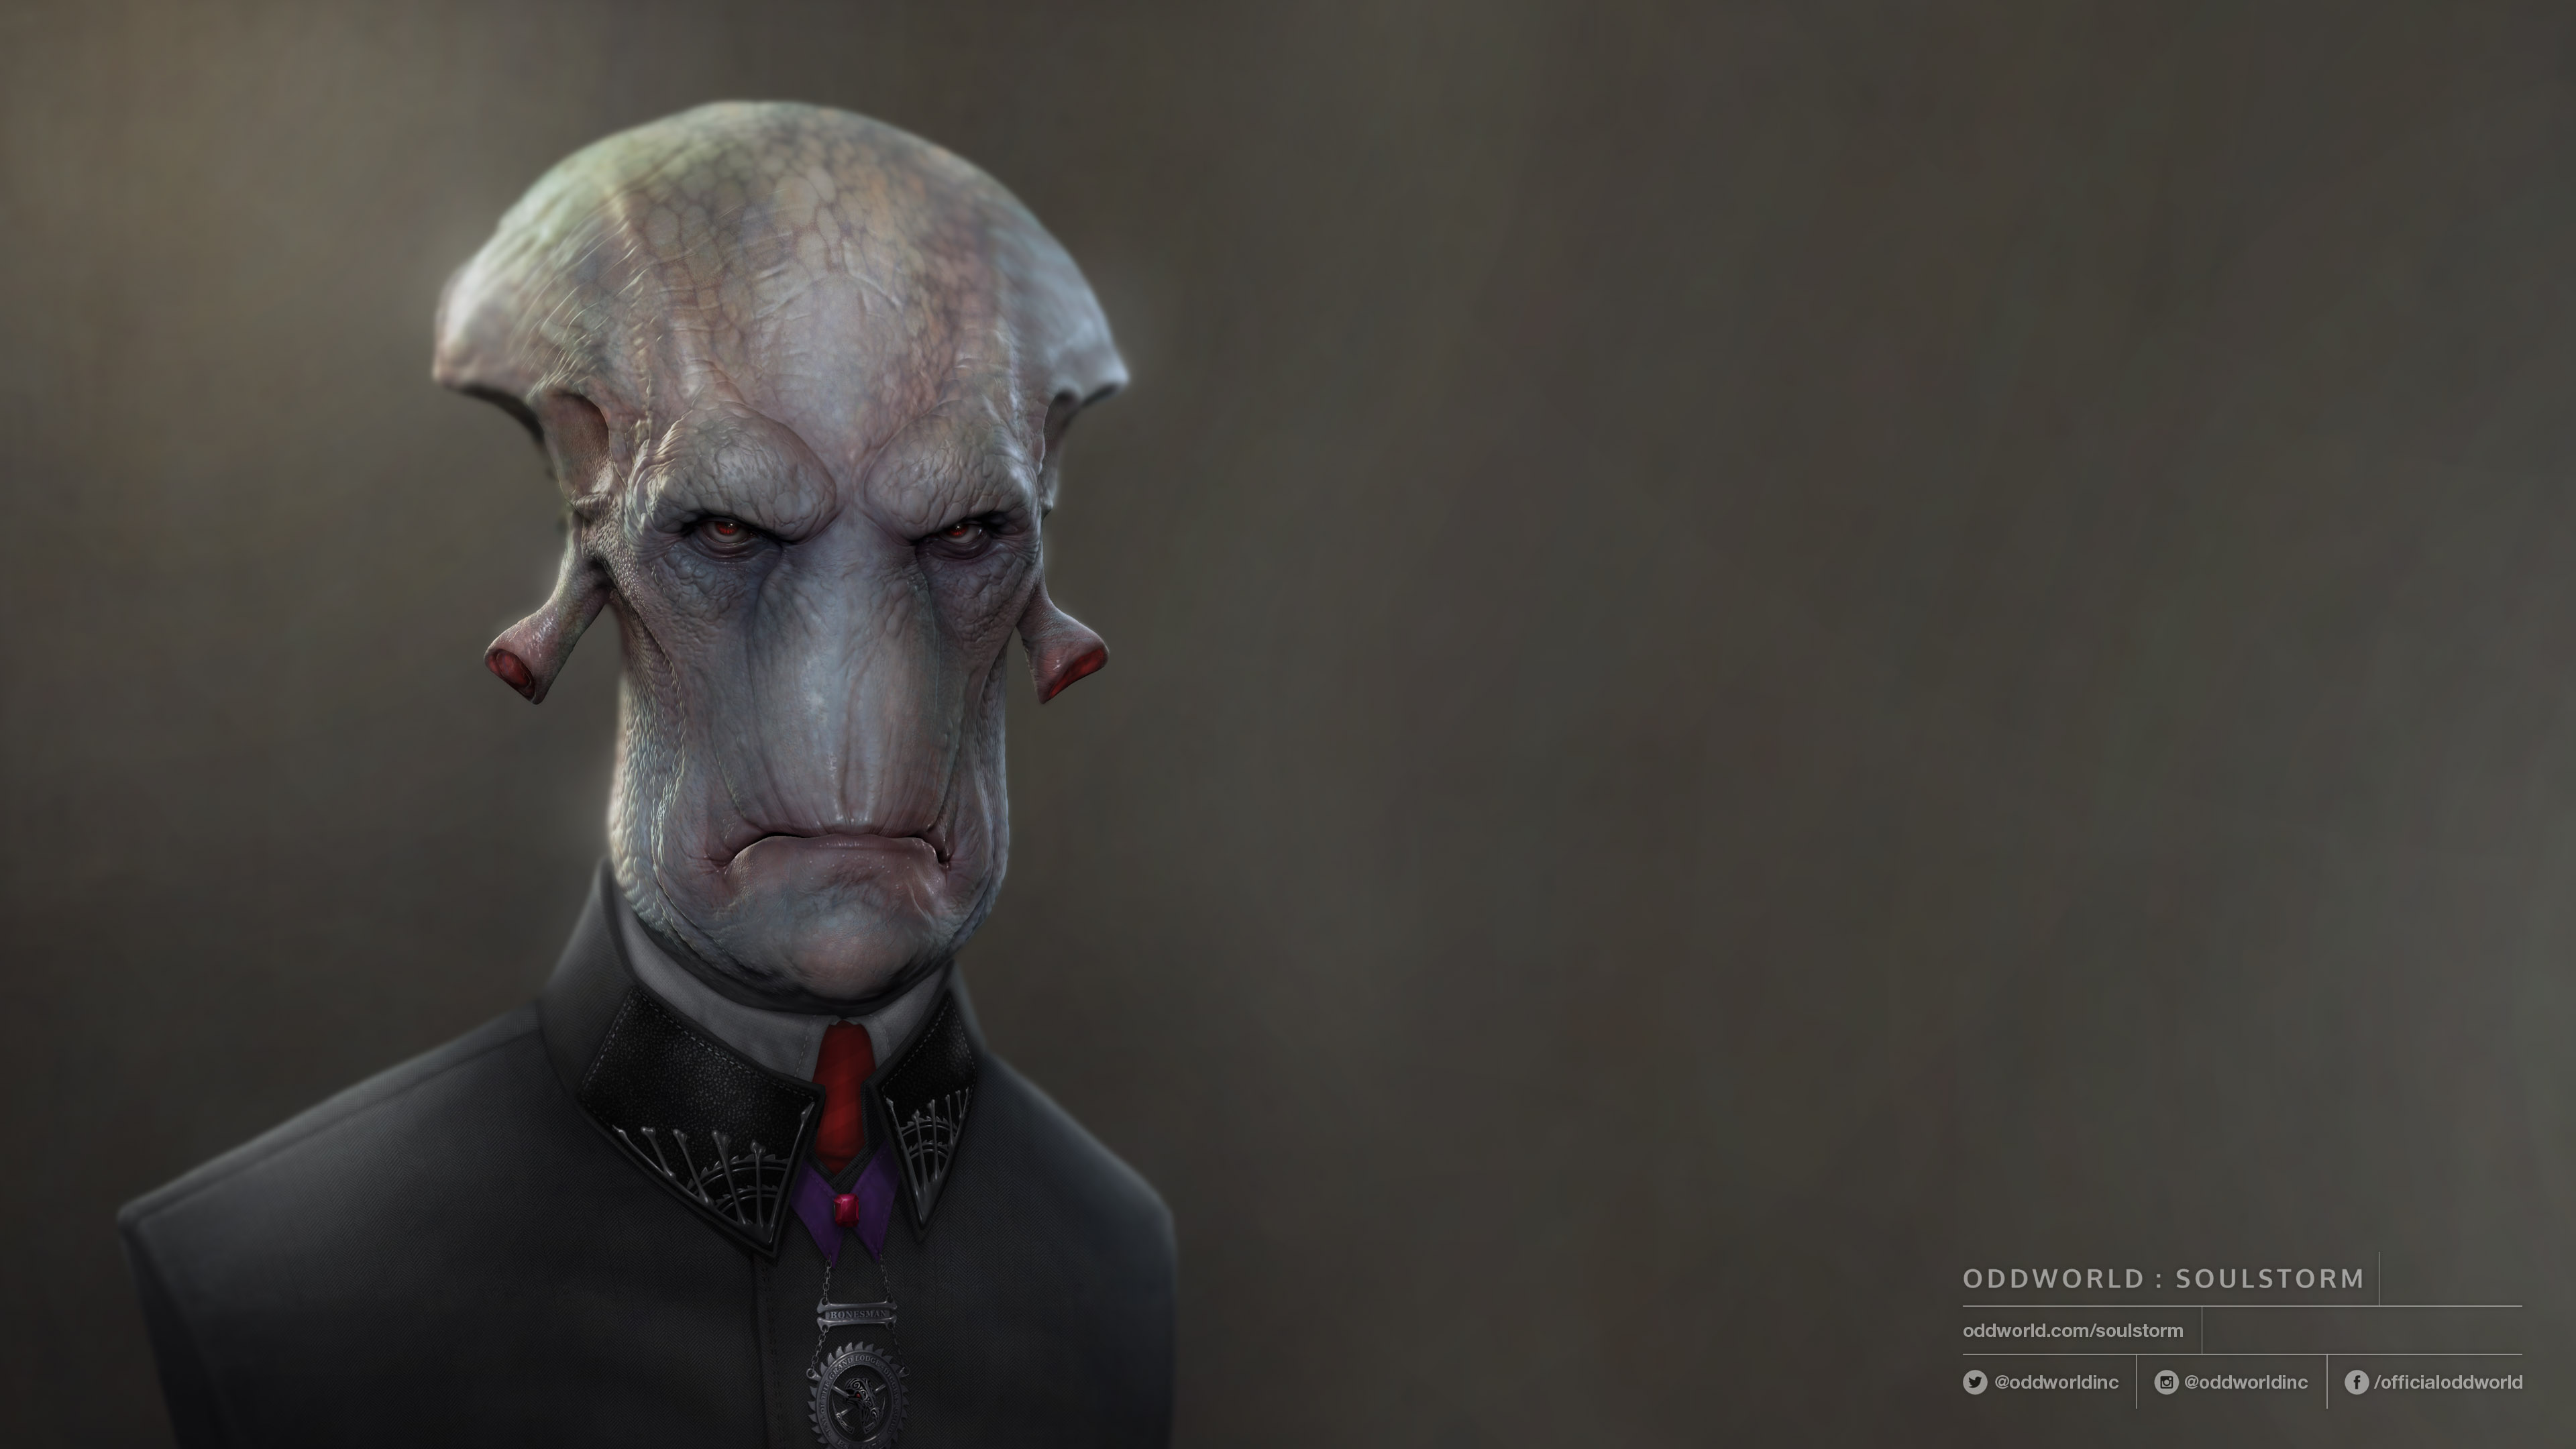 Glukkon 2 - Oddworld: Soulstorm 4K